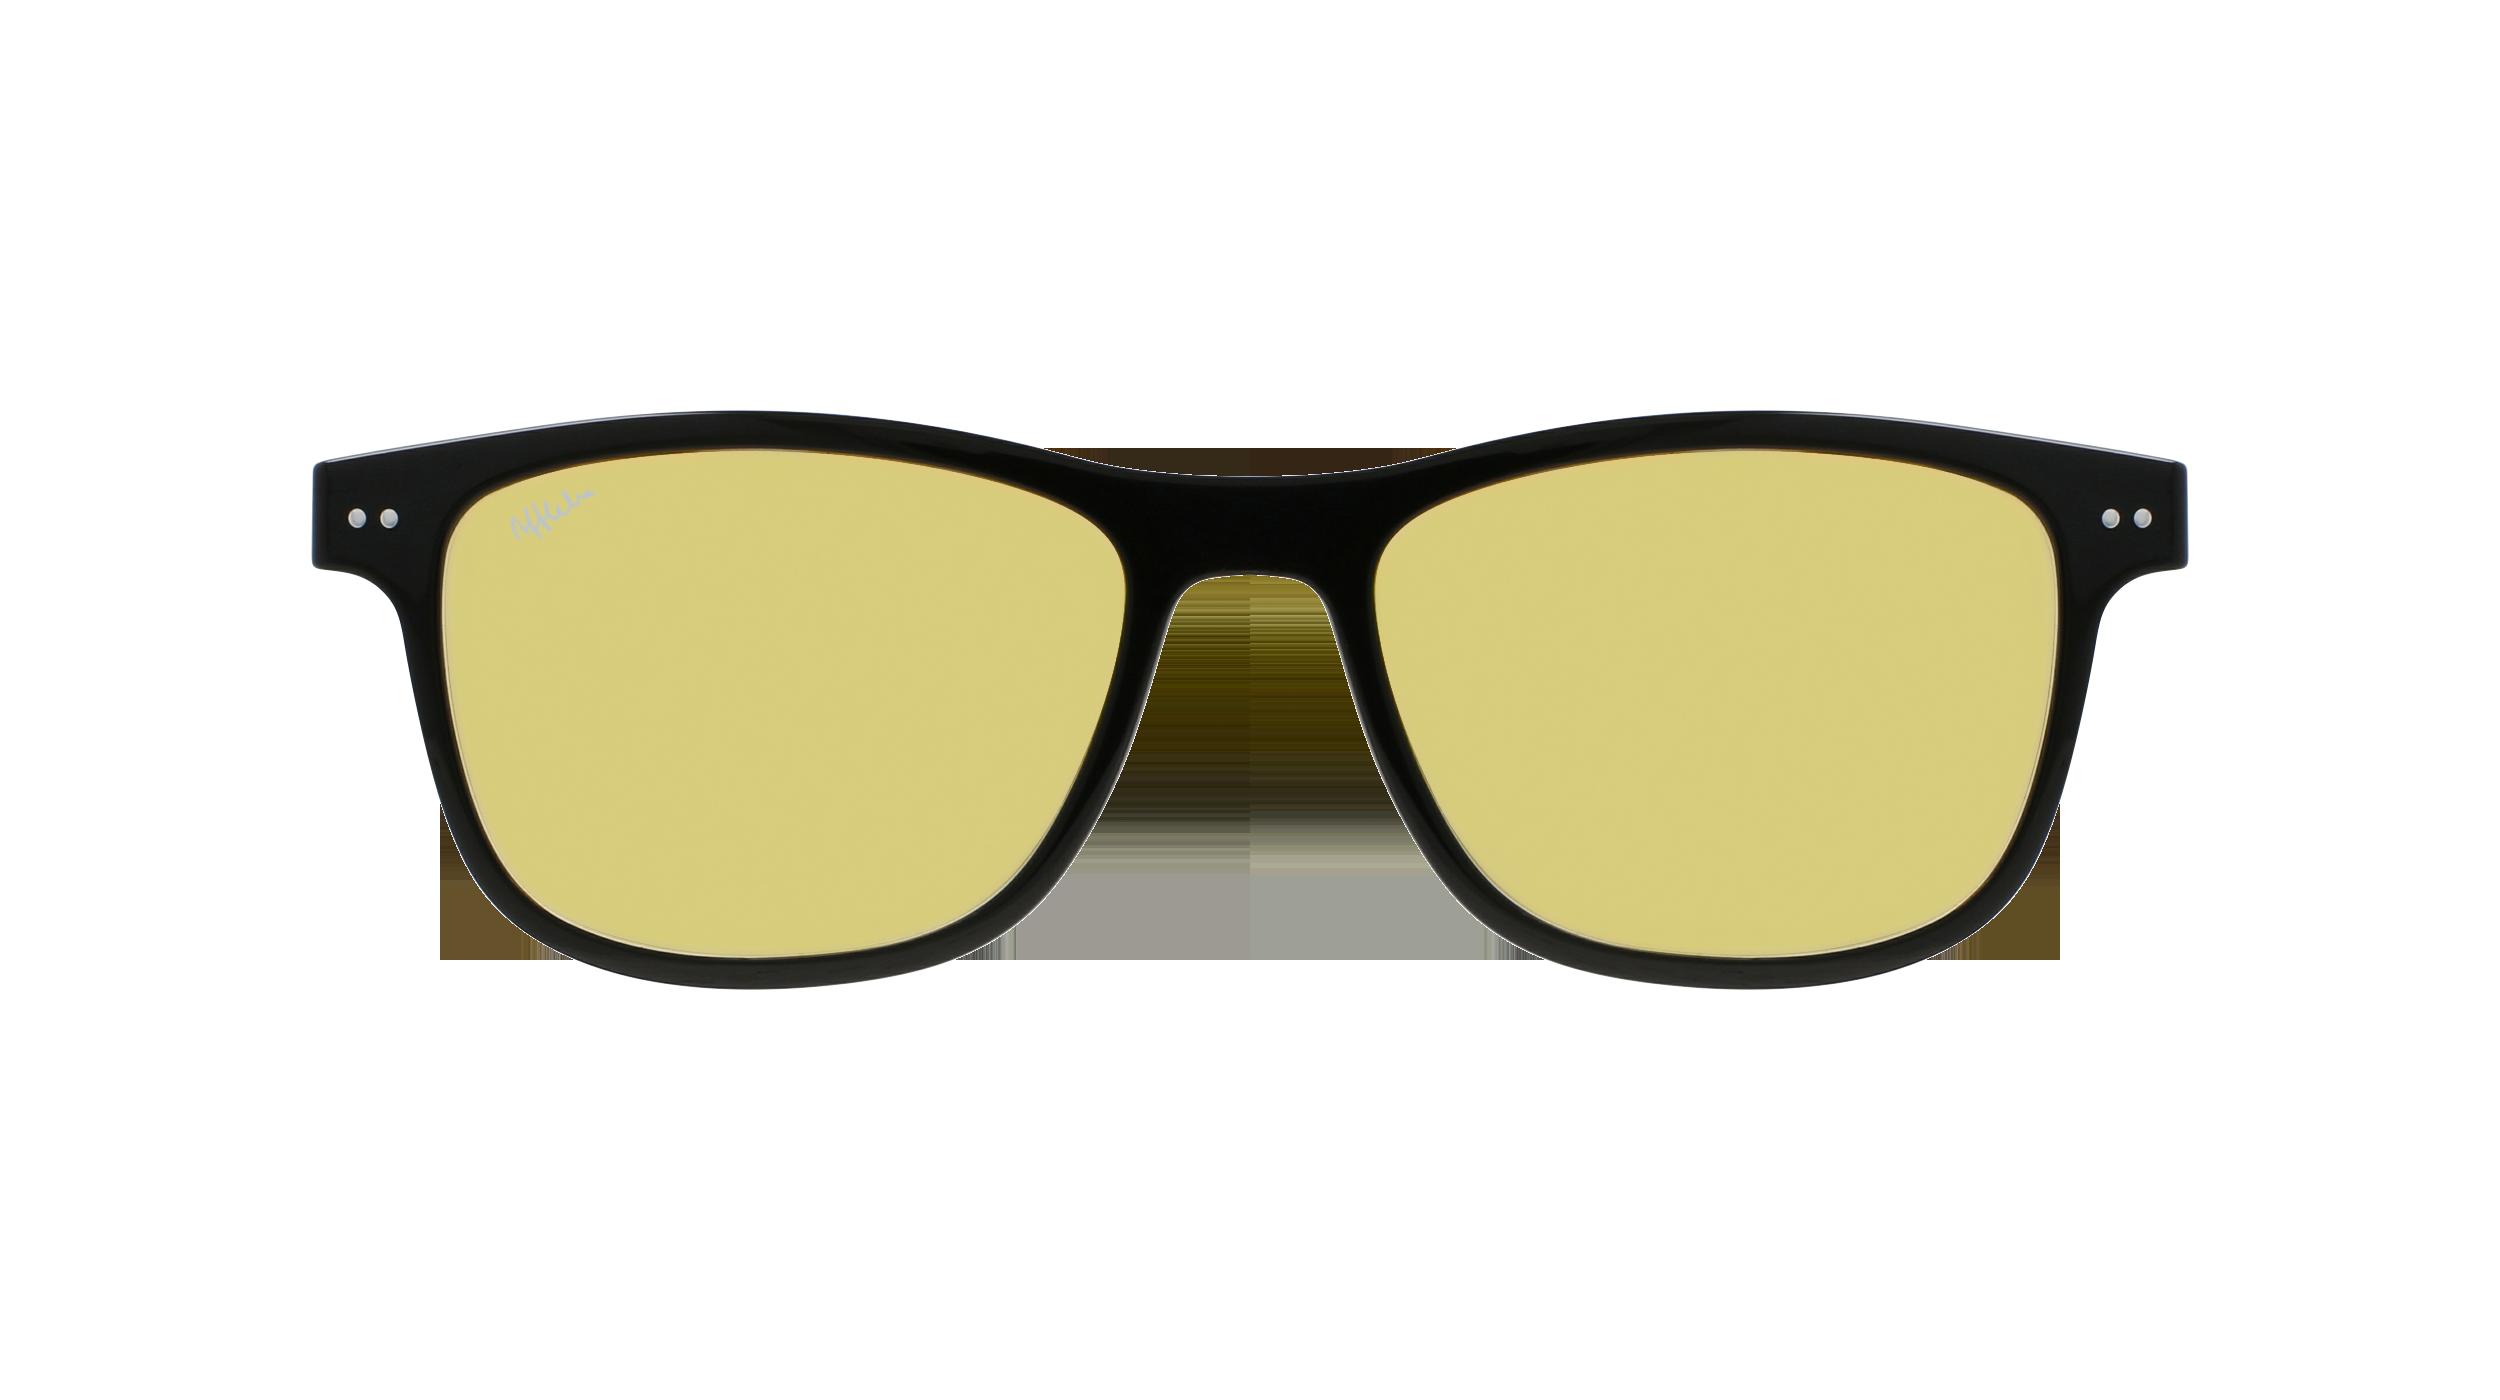 afflelou/france/products/smart_clip/clips_glasses/07630036436929.png